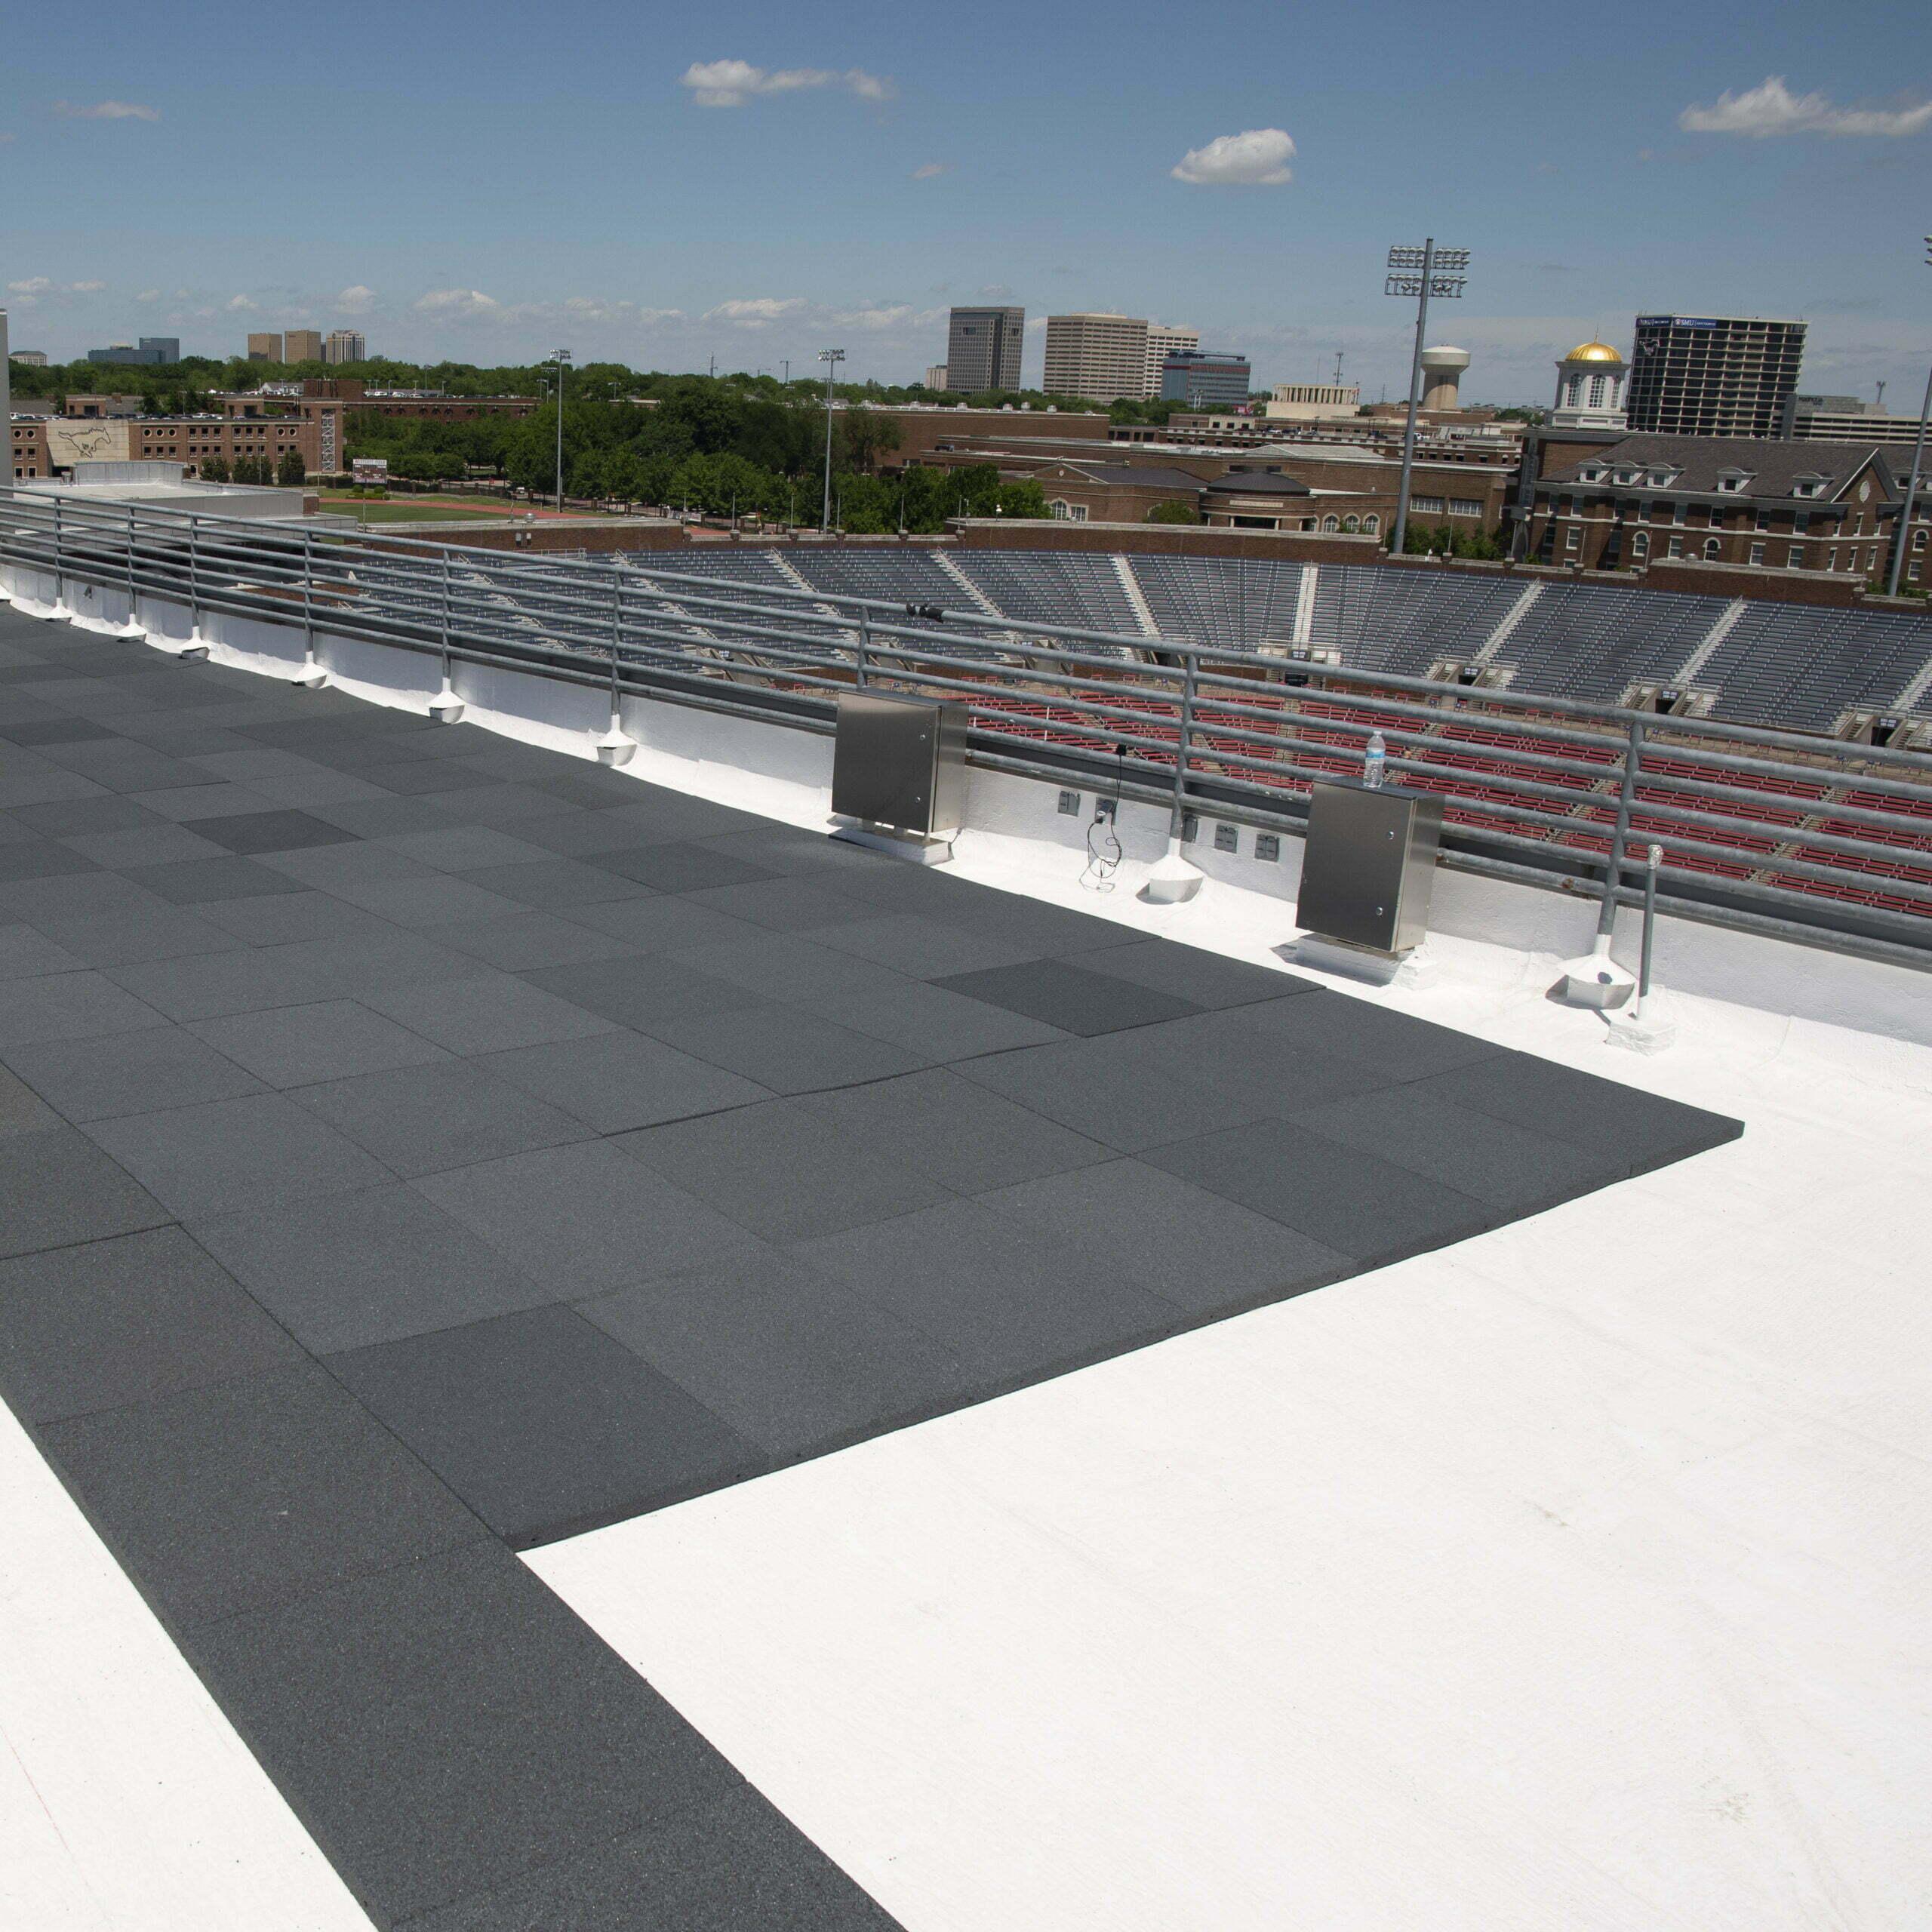 Image shot at SMU Stadium, Pavers Install on Suites, Dallas, Texas, April 25, 2019, Jeffrey Parr/Supreme Roofing